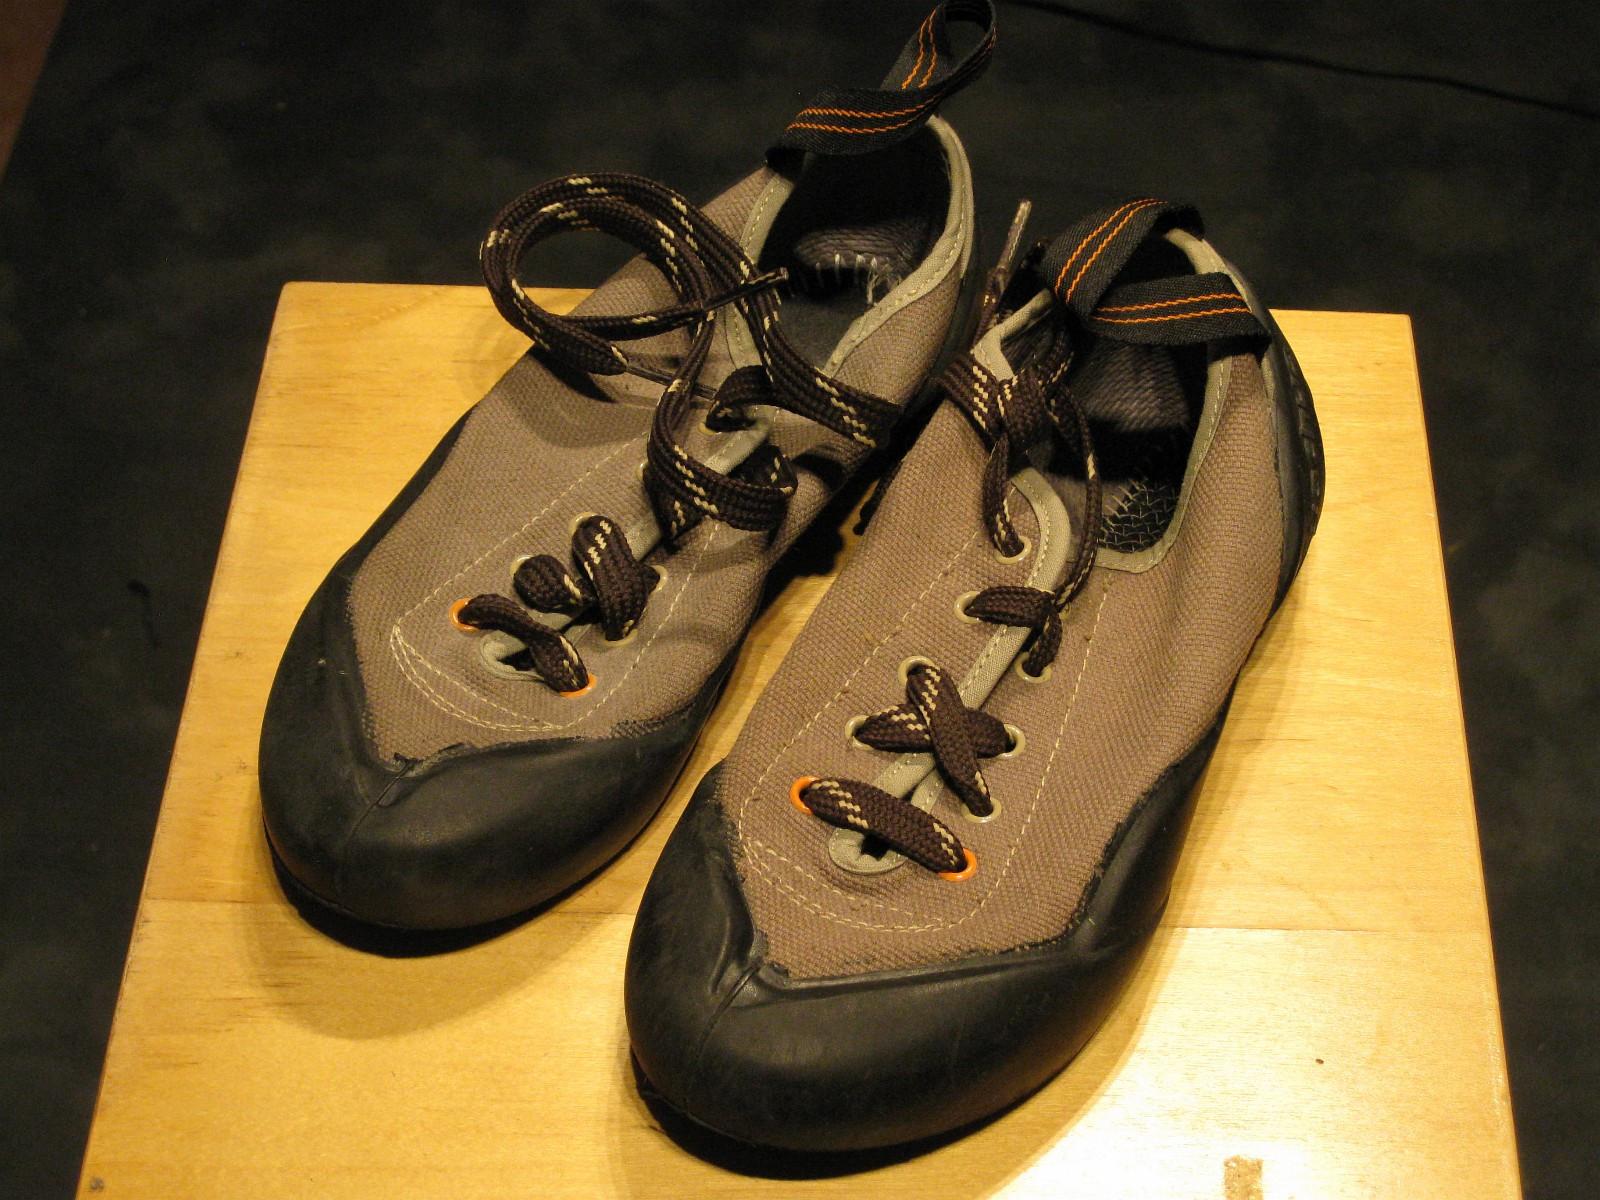 Klatresko 37 - Kråkstad  - Quechua size 37 (but good for size 38) good for beginners - Kråkstad